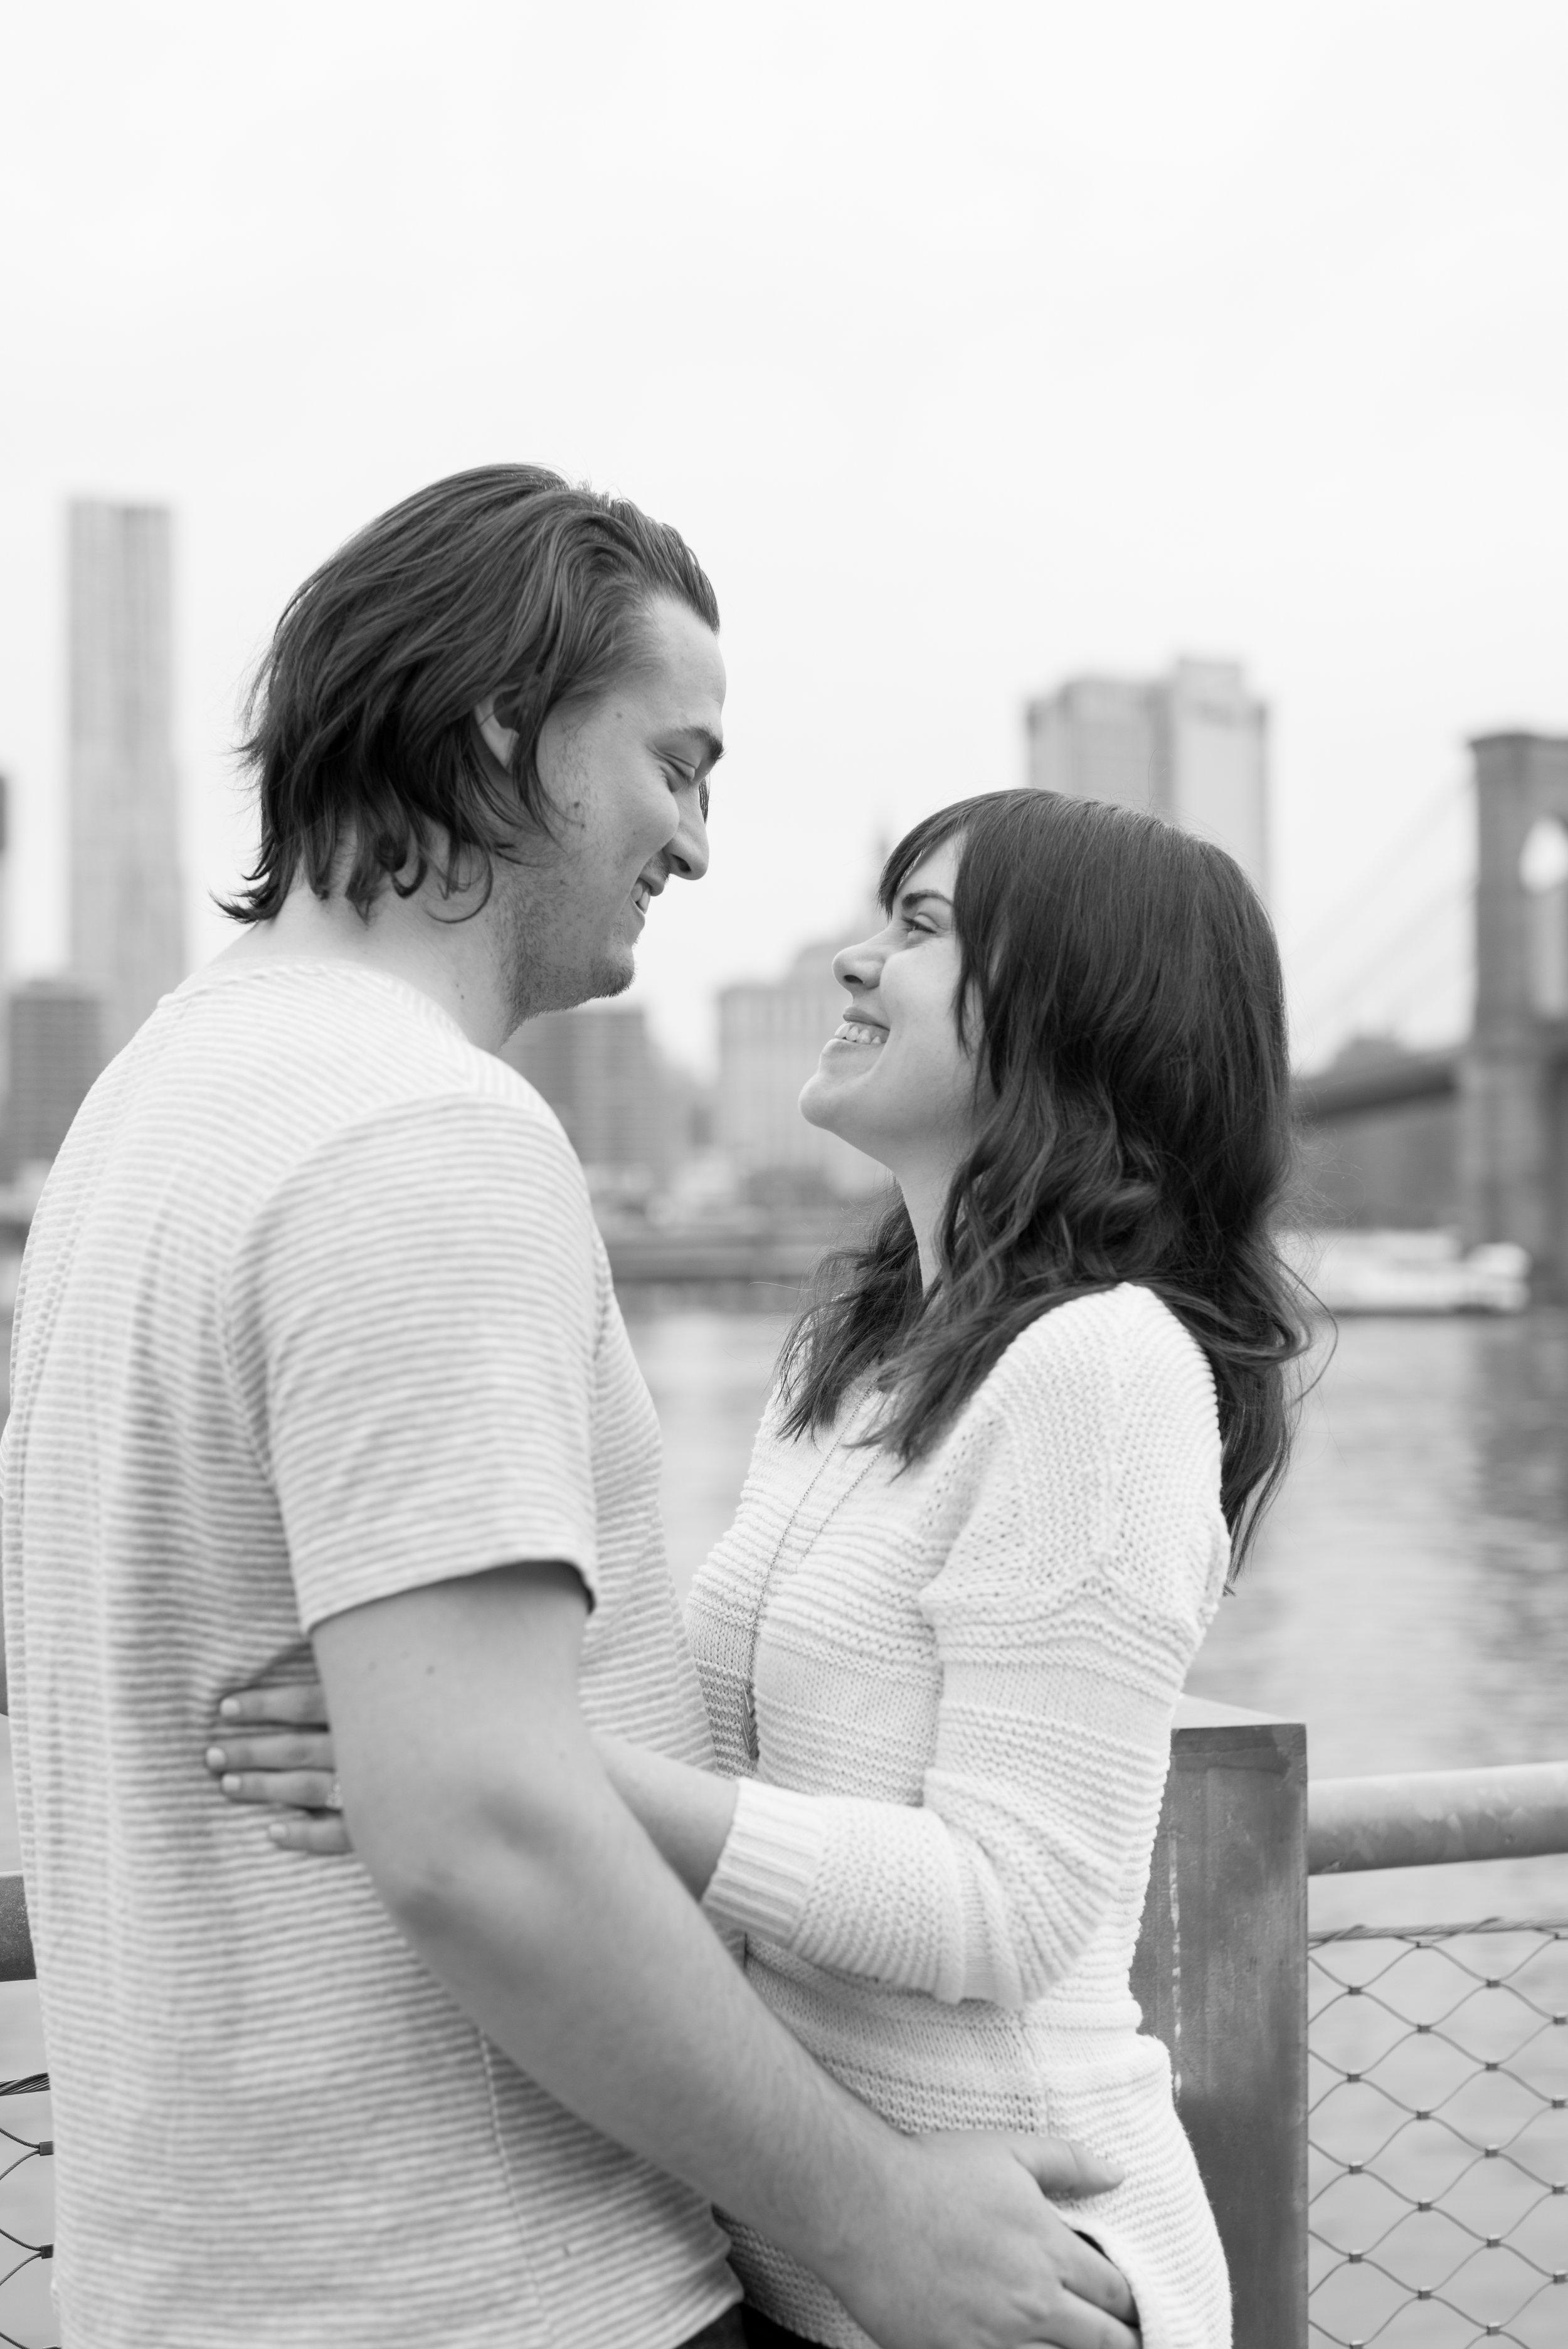 Maura+Kyle- Brooklyn Bridge Engagement Session- New York- Olivia Christina Photo-18.JPG